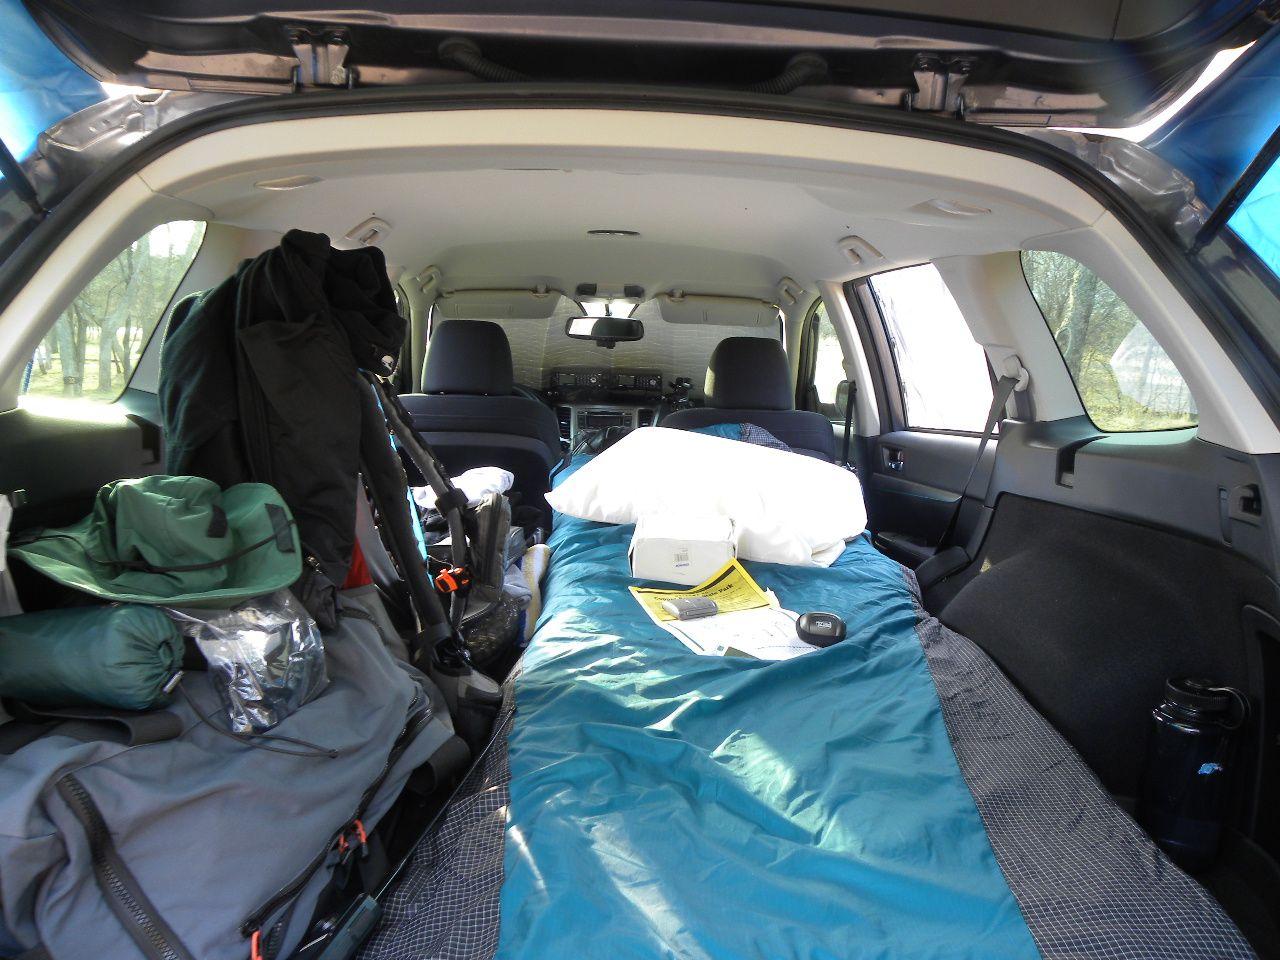 Subaru Outback Camping